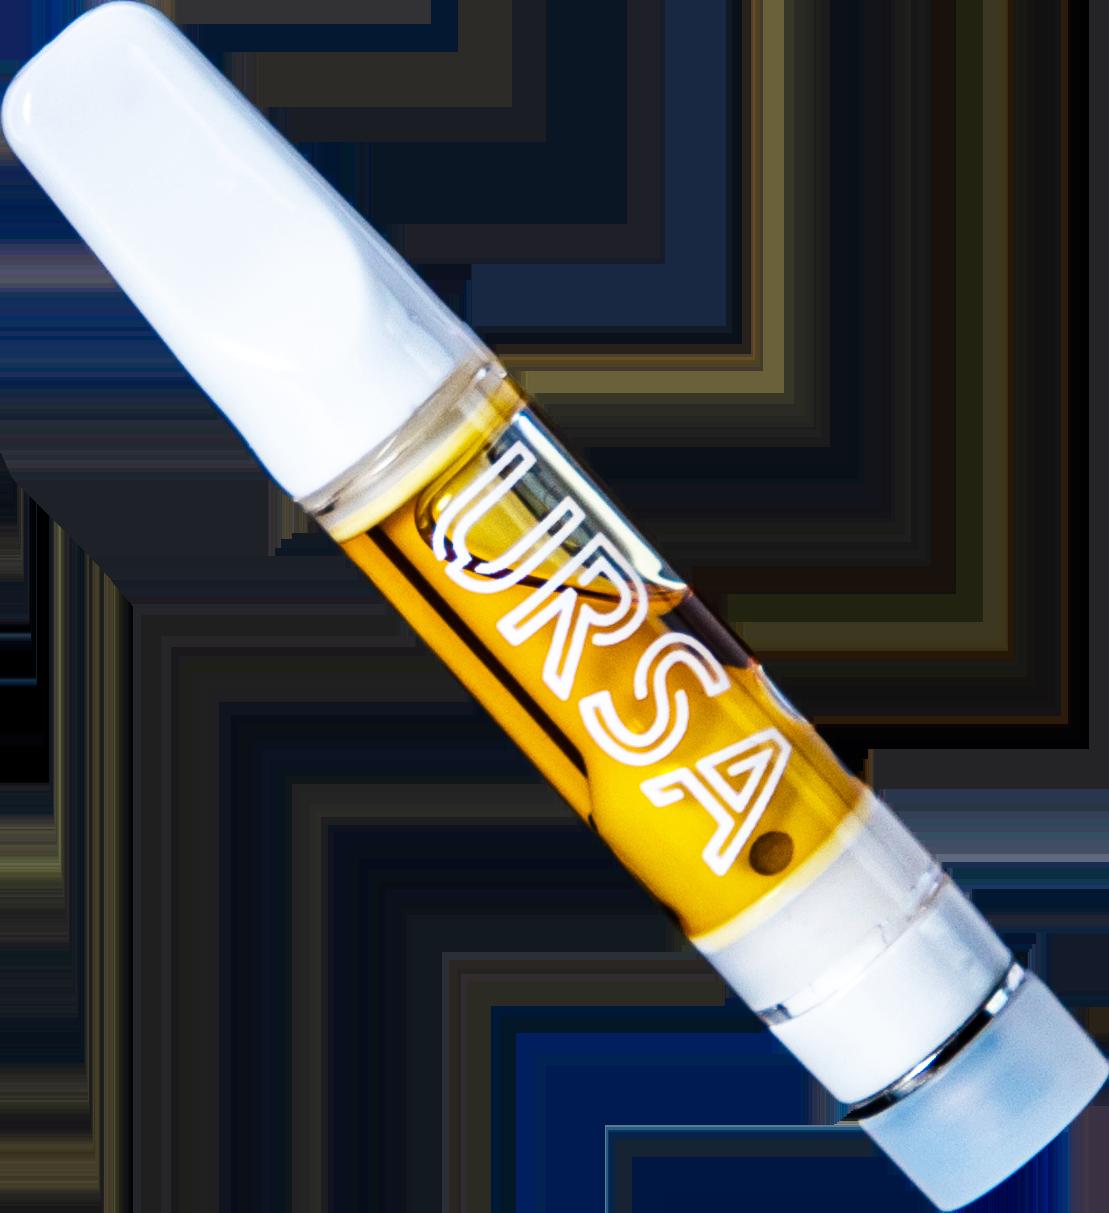 URSA Liquid Diamond Sauce Cartridge - the first 100% Live Resin Cartridge in california that is distillate-free